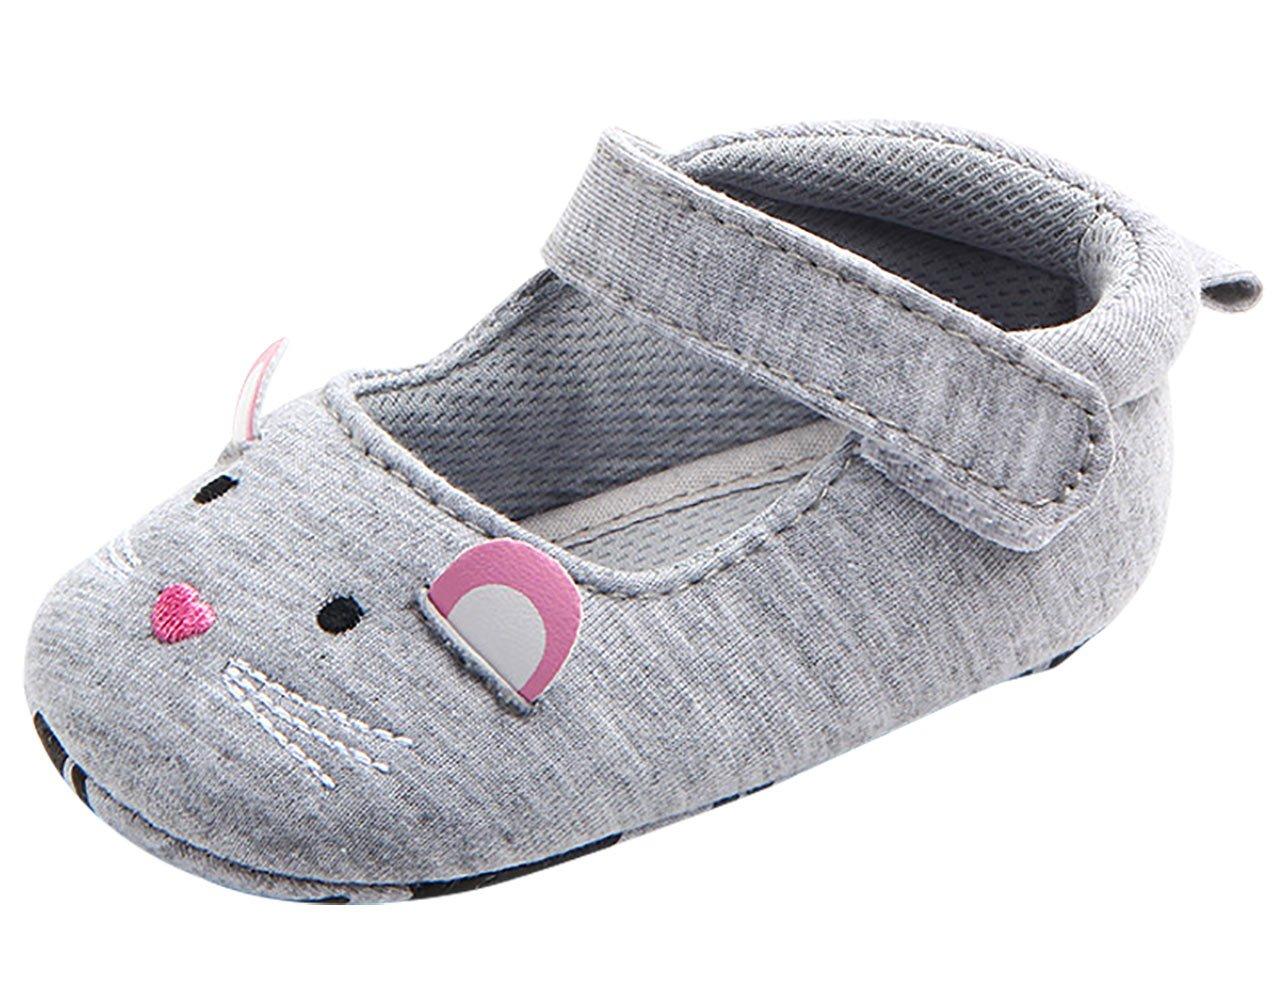 Tongyouyuan - Zapatos Antideslizantes para Bebés Niñas de Algodón Suave Transpirable Casual con Suela de Goma Zapatillas de Primeros Pasos Baby Shoes - 0-6 Meses - Rosa